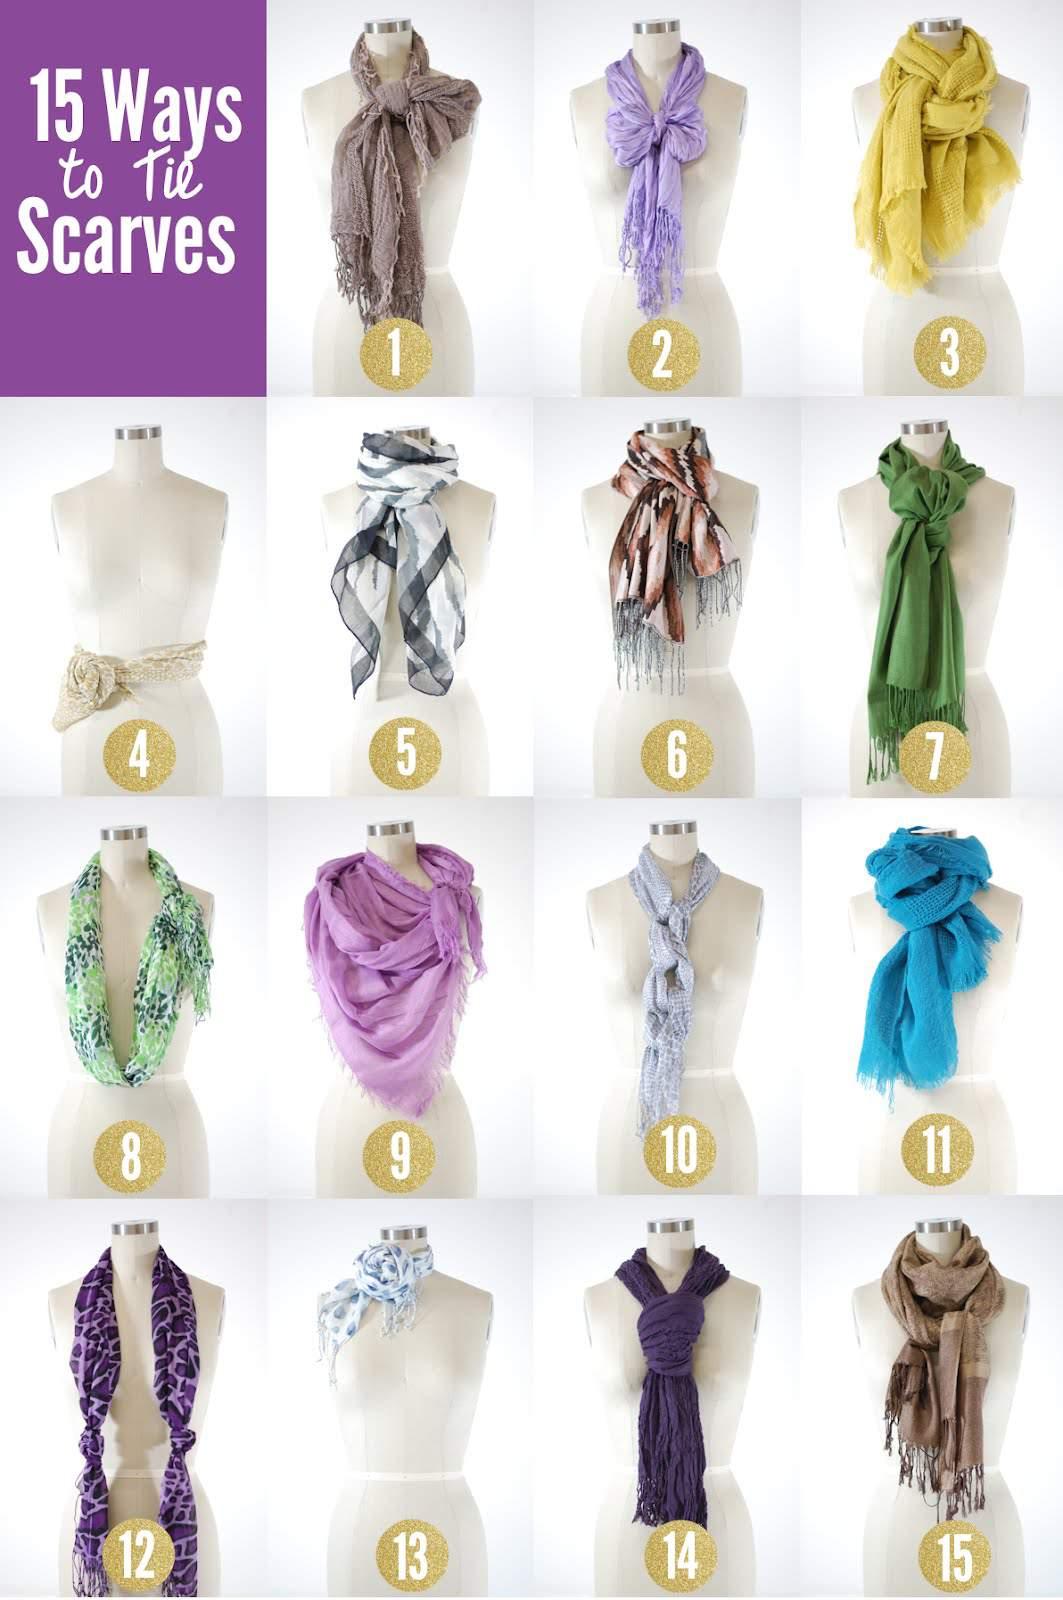 15 Ways to Tie a Scarf on The Curvy Fashionista